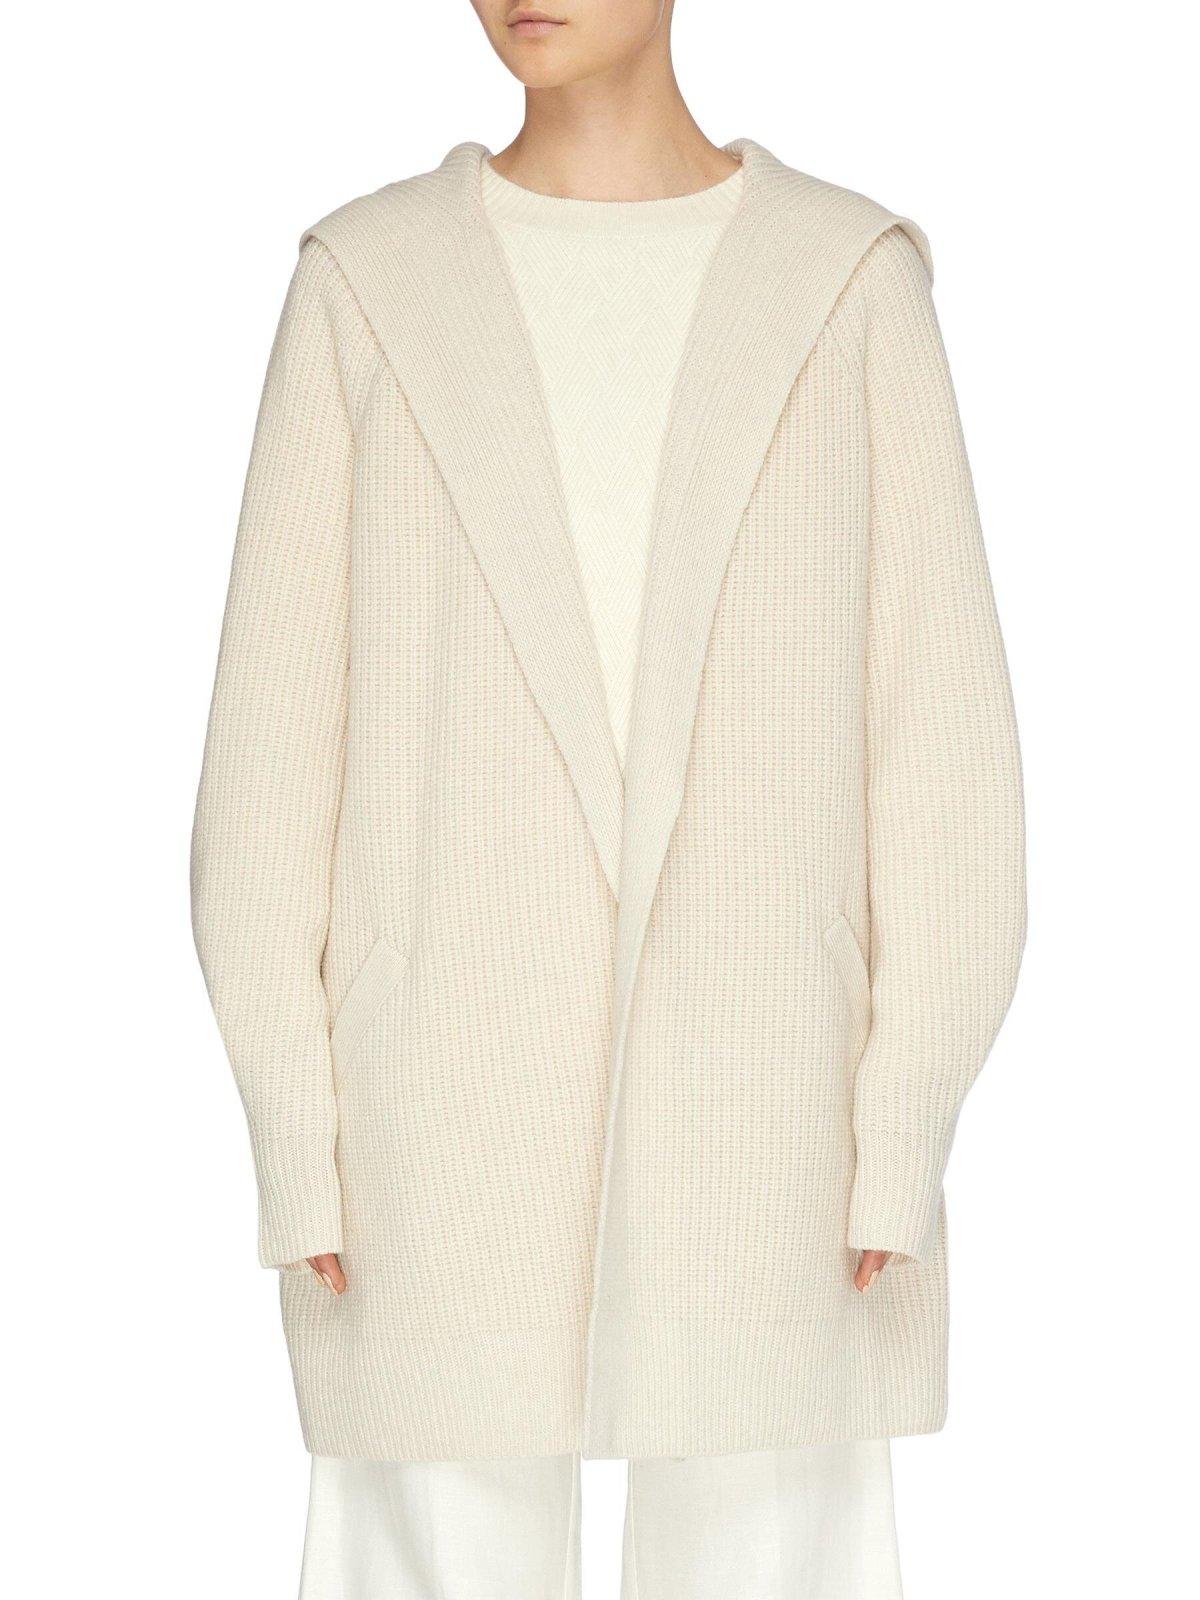 CRUSH COLLECTION Rib Knit Long Cashmere Cardigan HK$4,800